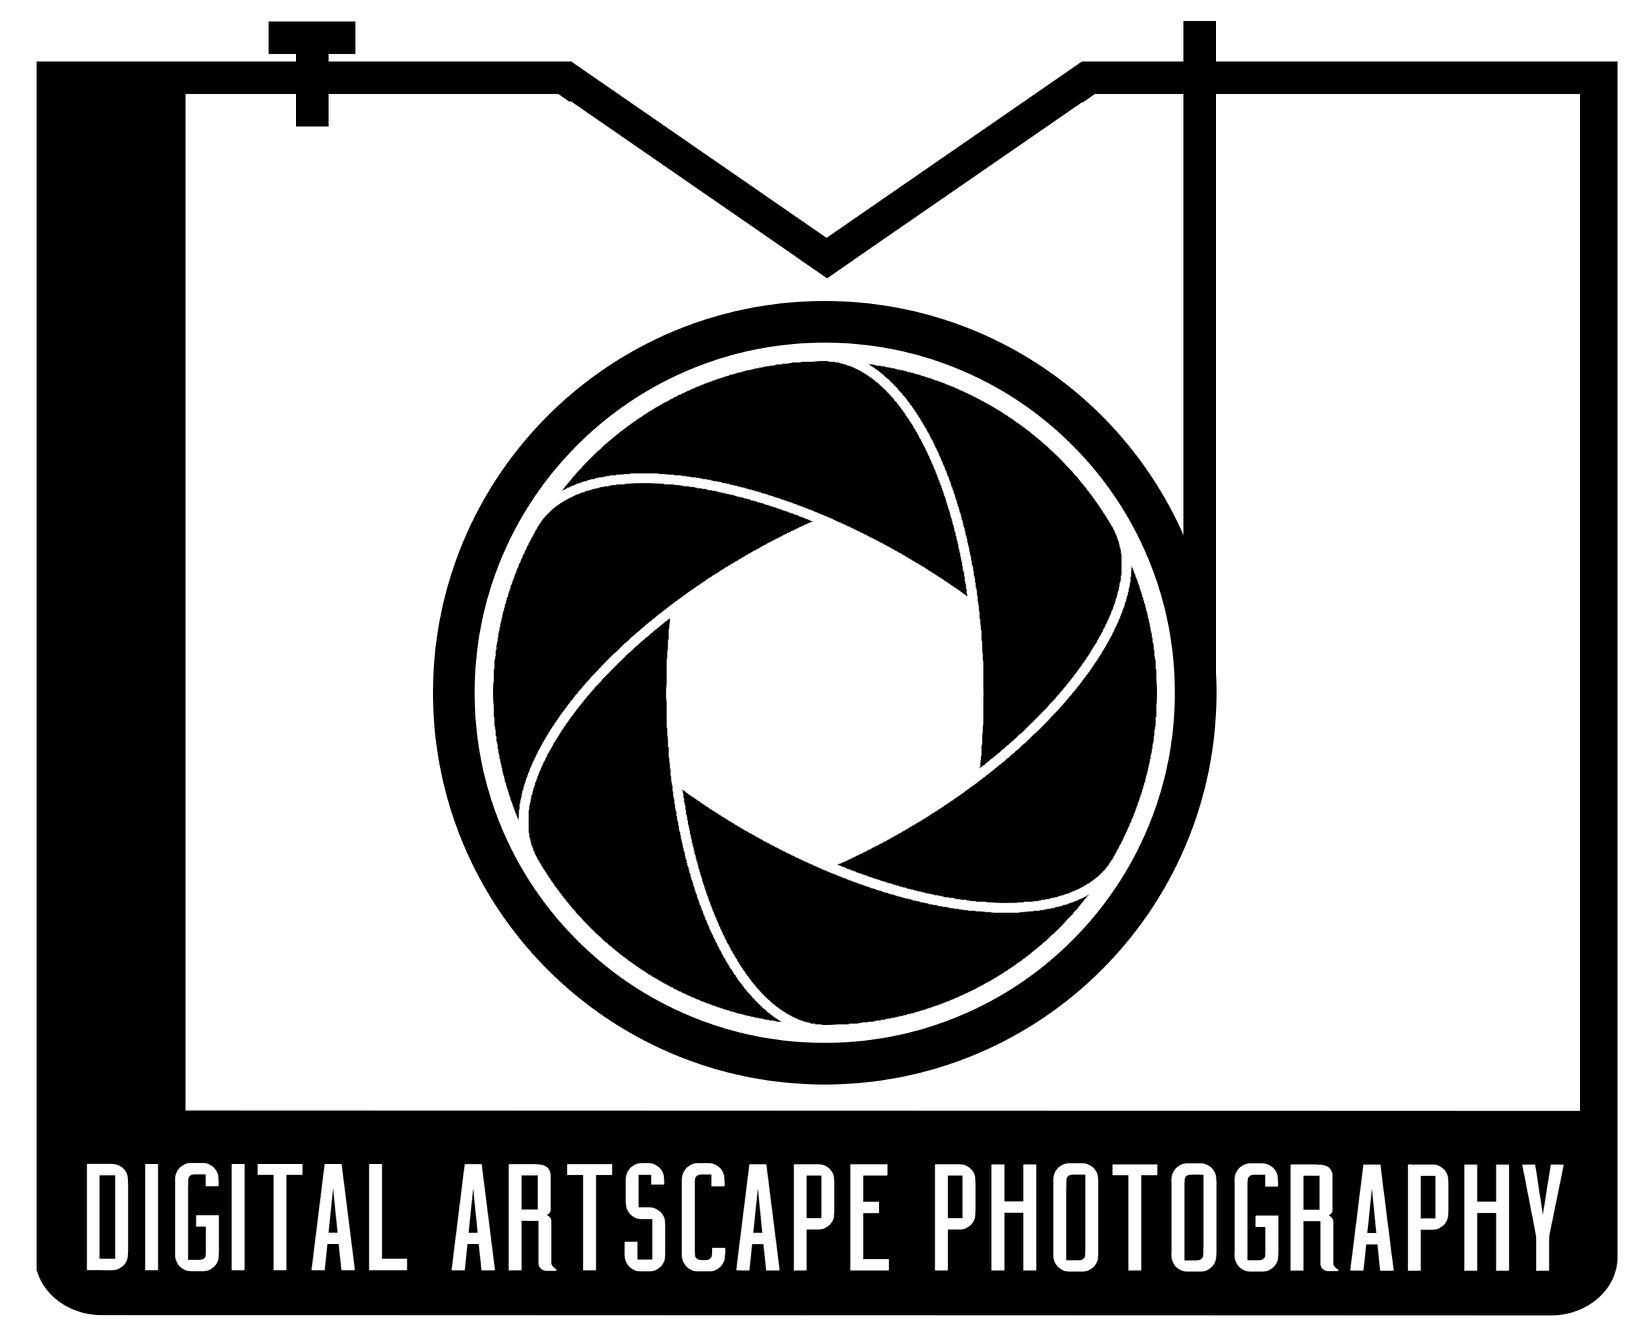 Digital Artscape, LLC floor plan in Jersey City Newark New York